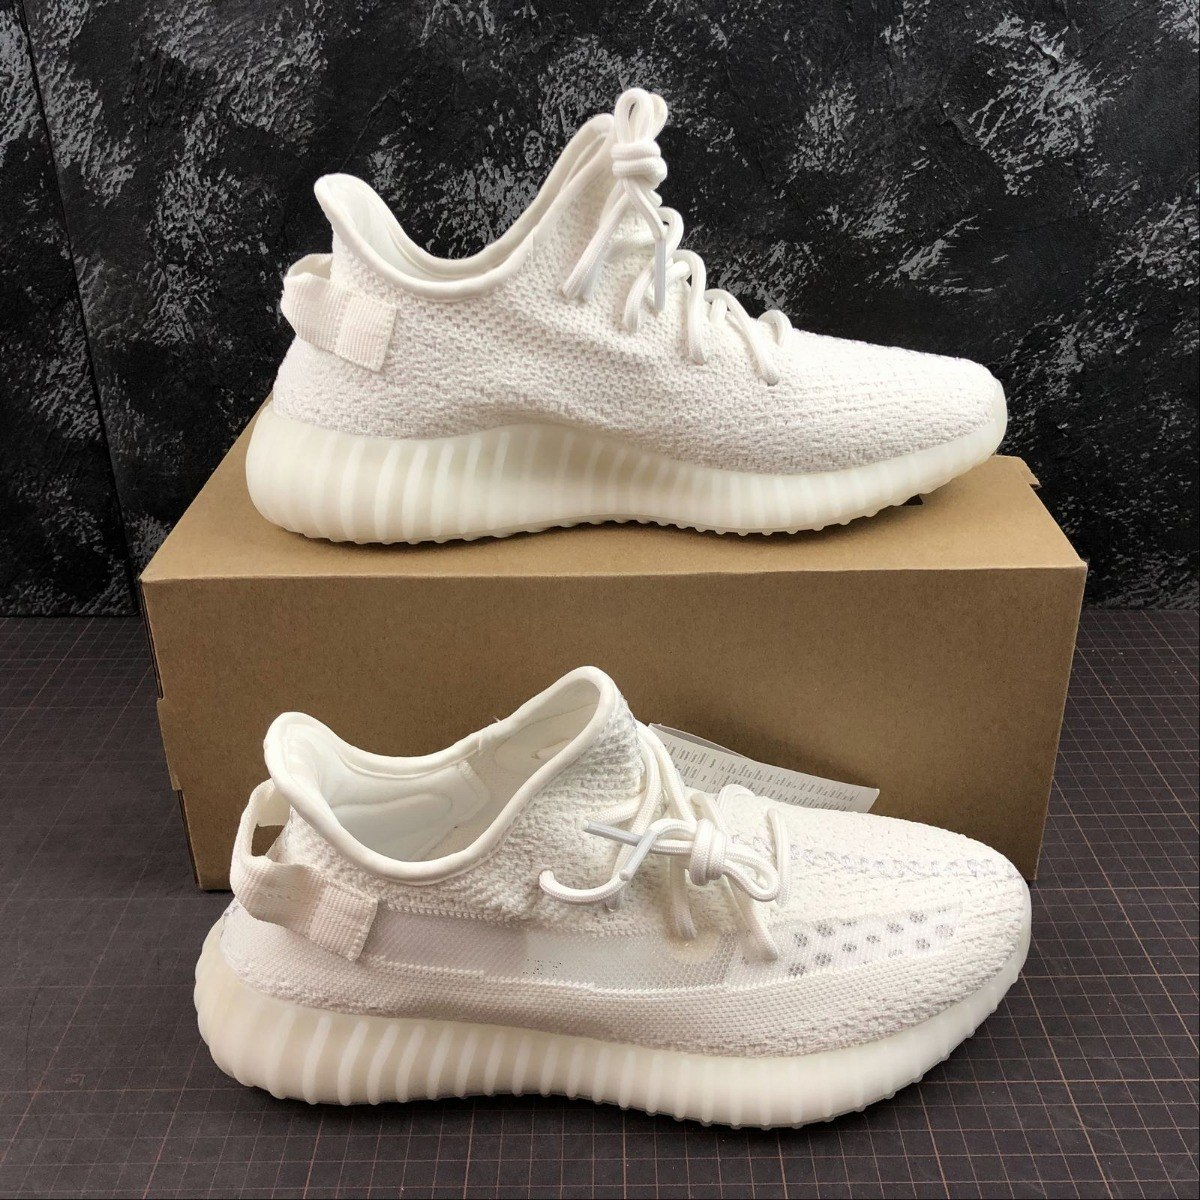 cheap for discount 032bb 31e09 adidas Yeezy Boost 350 V2 Triple White